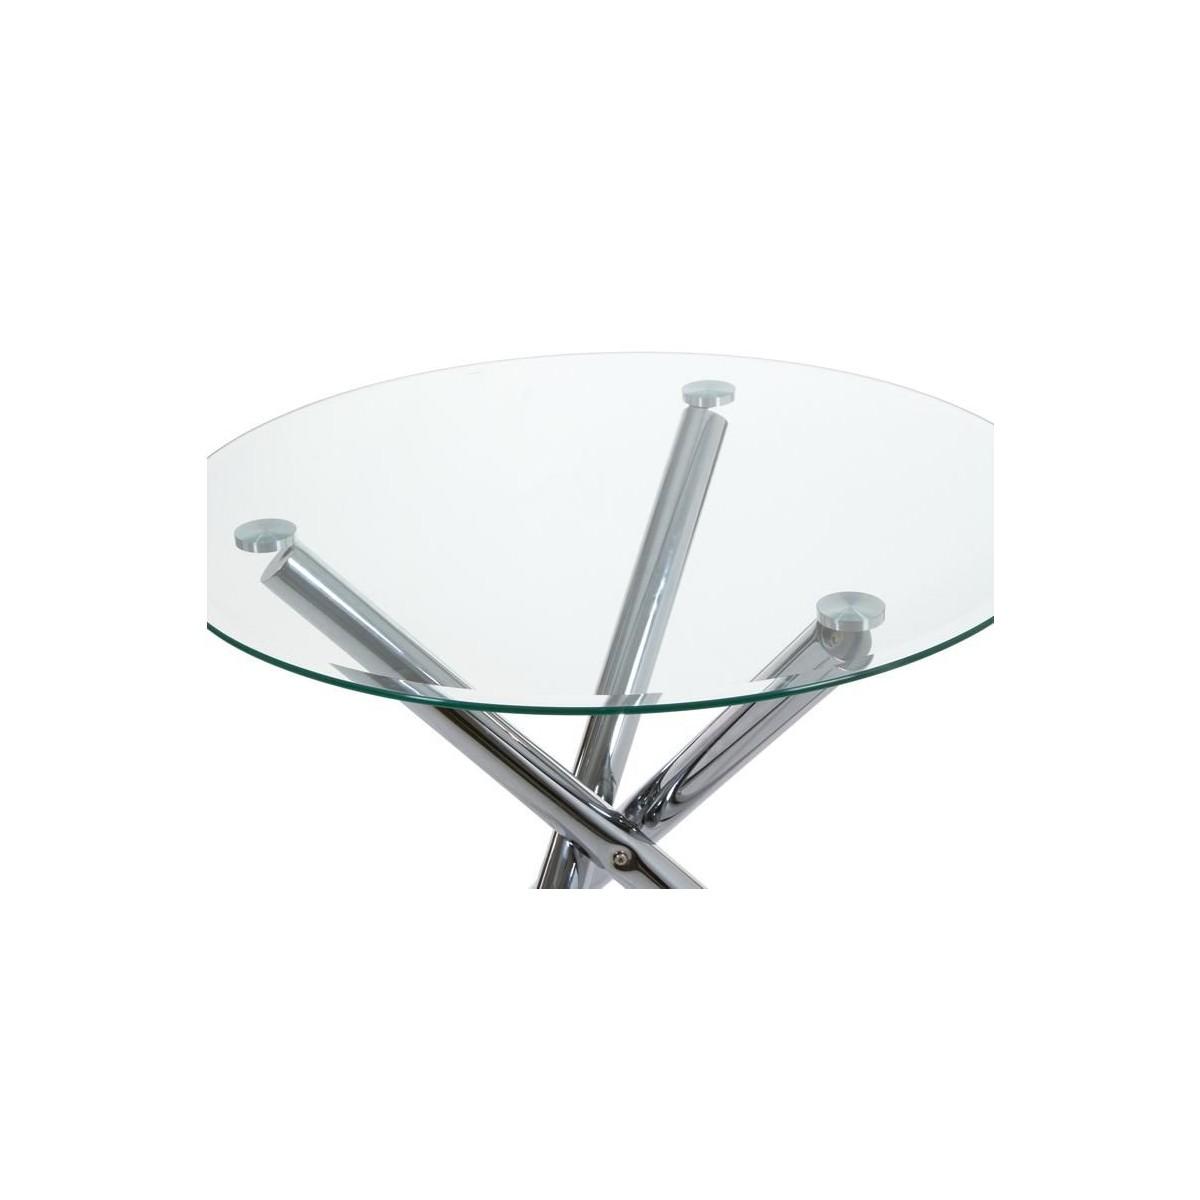 Mesa de comedor moderna redonda cristal de santiago pons for Santiago pons decoracion